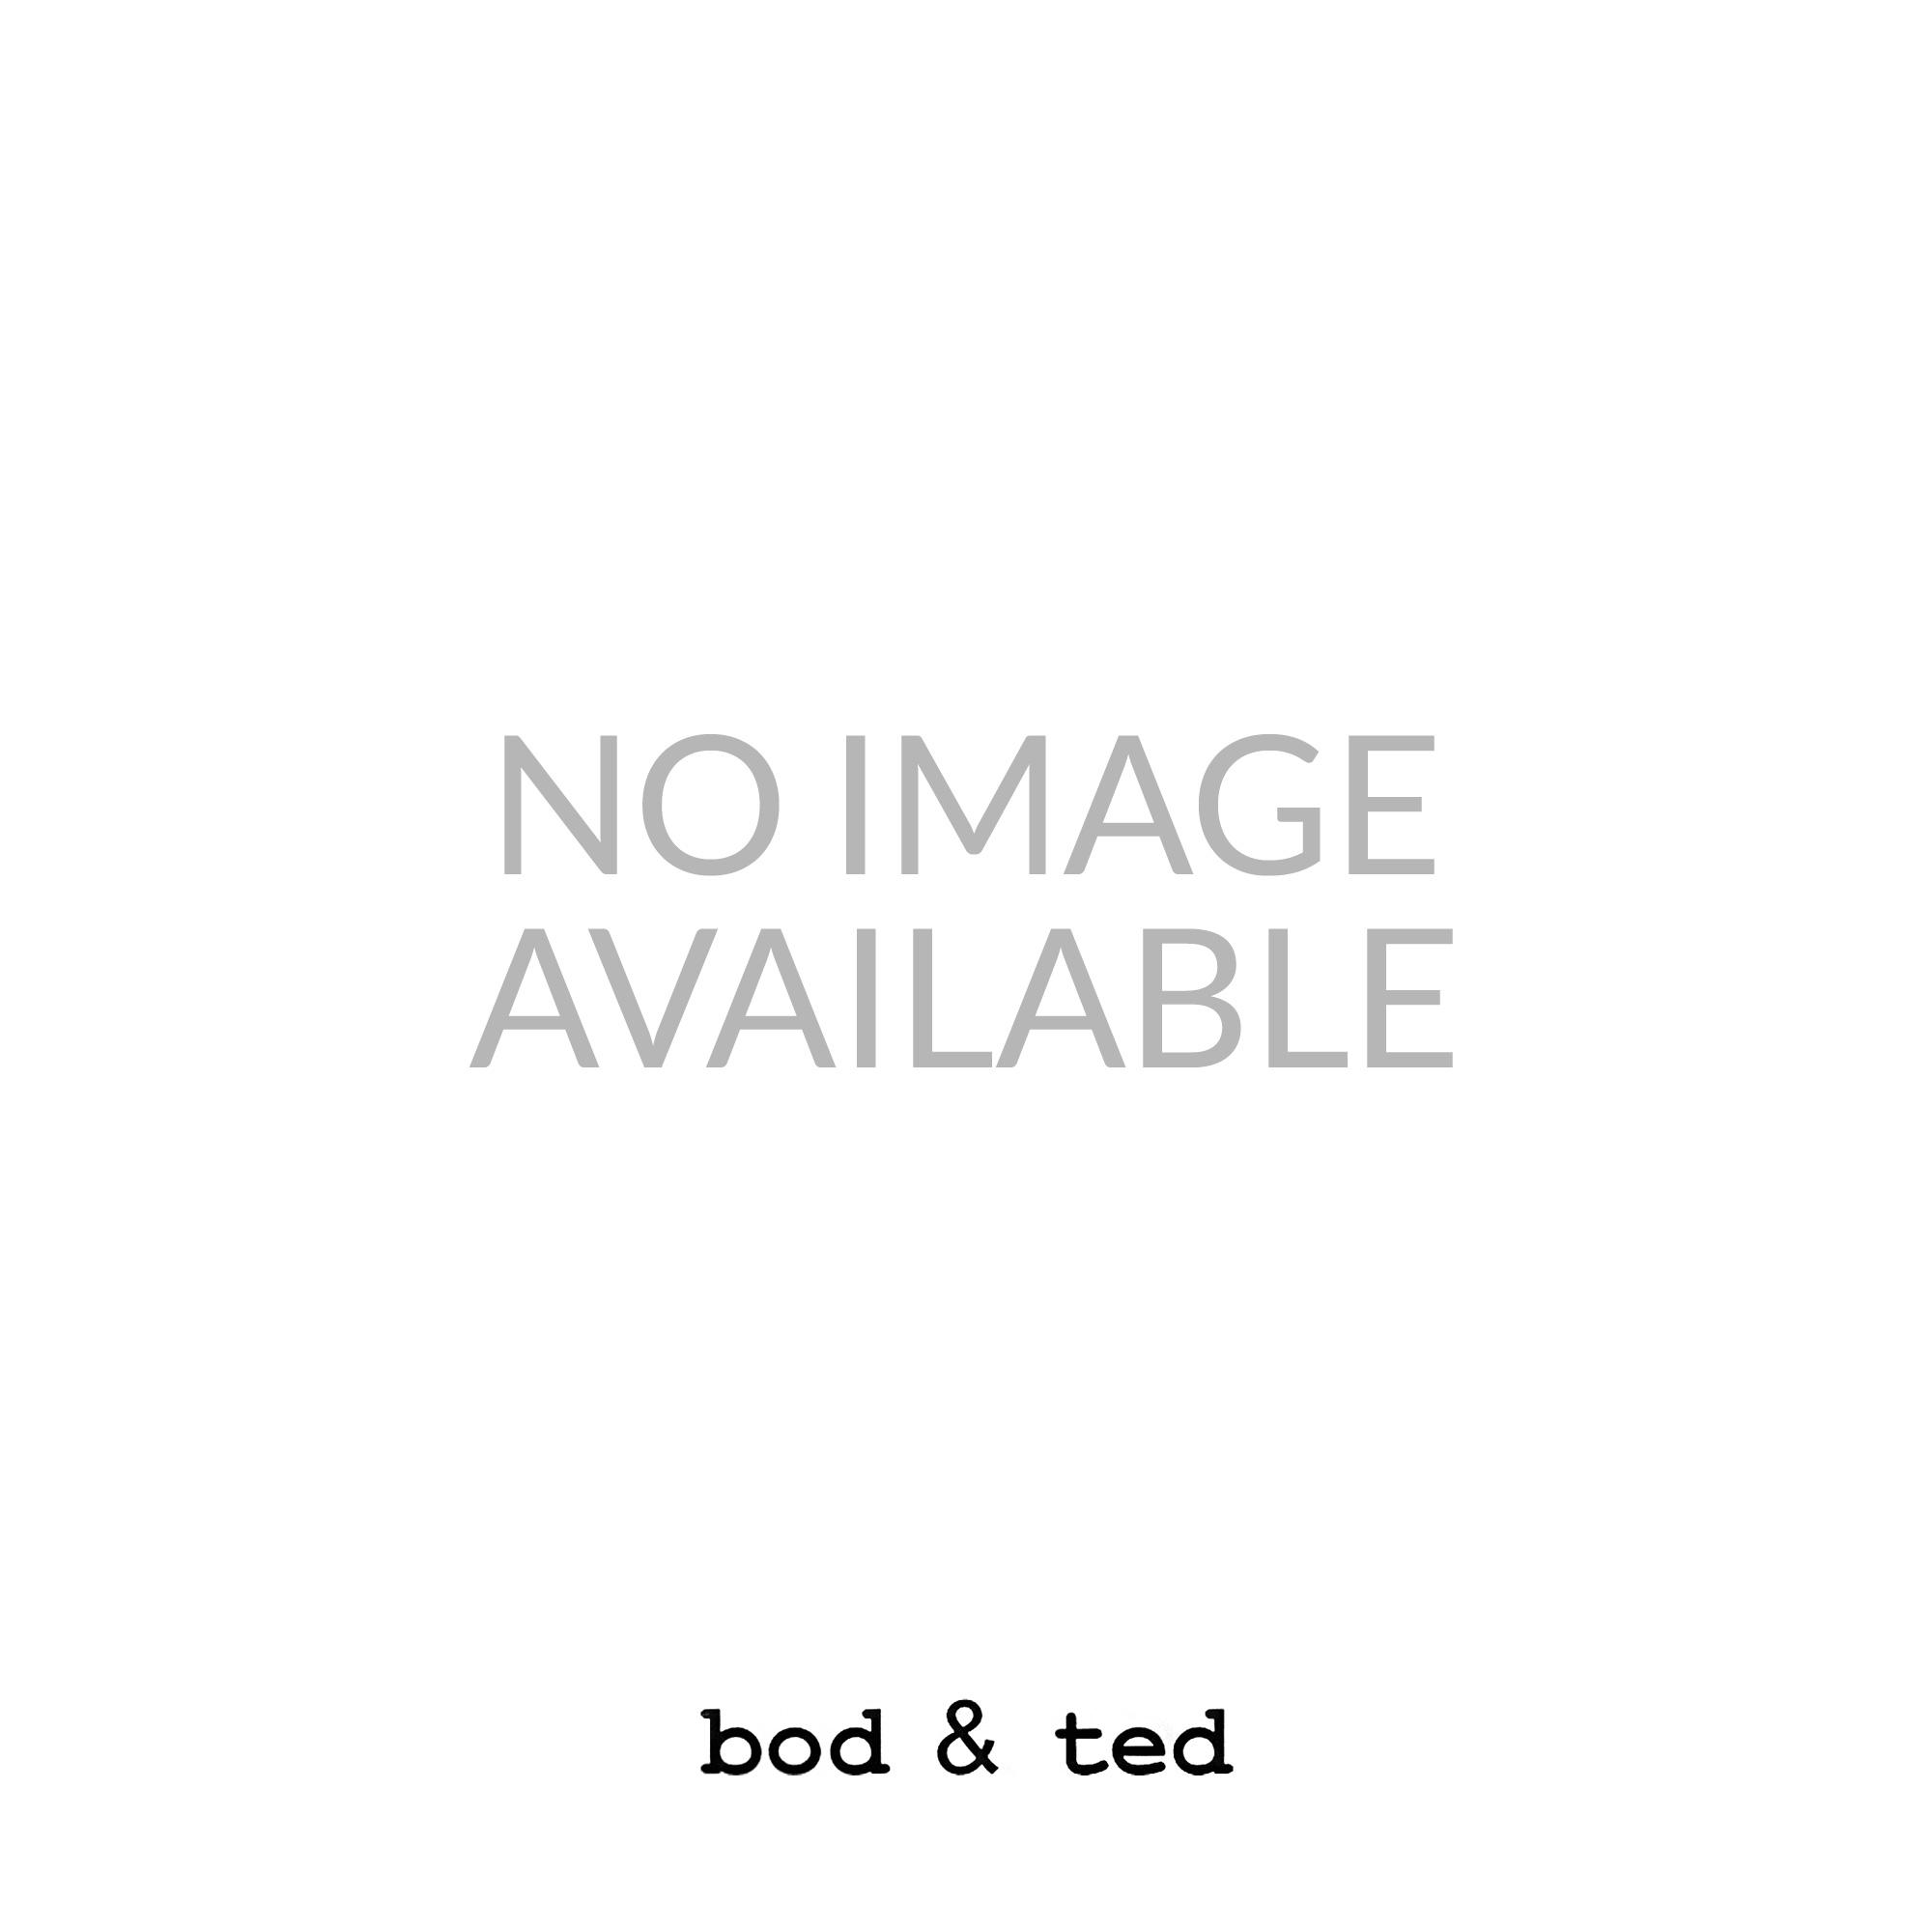 360 Sweater Brito Cashmere Cardigan in Heather Grey and Black